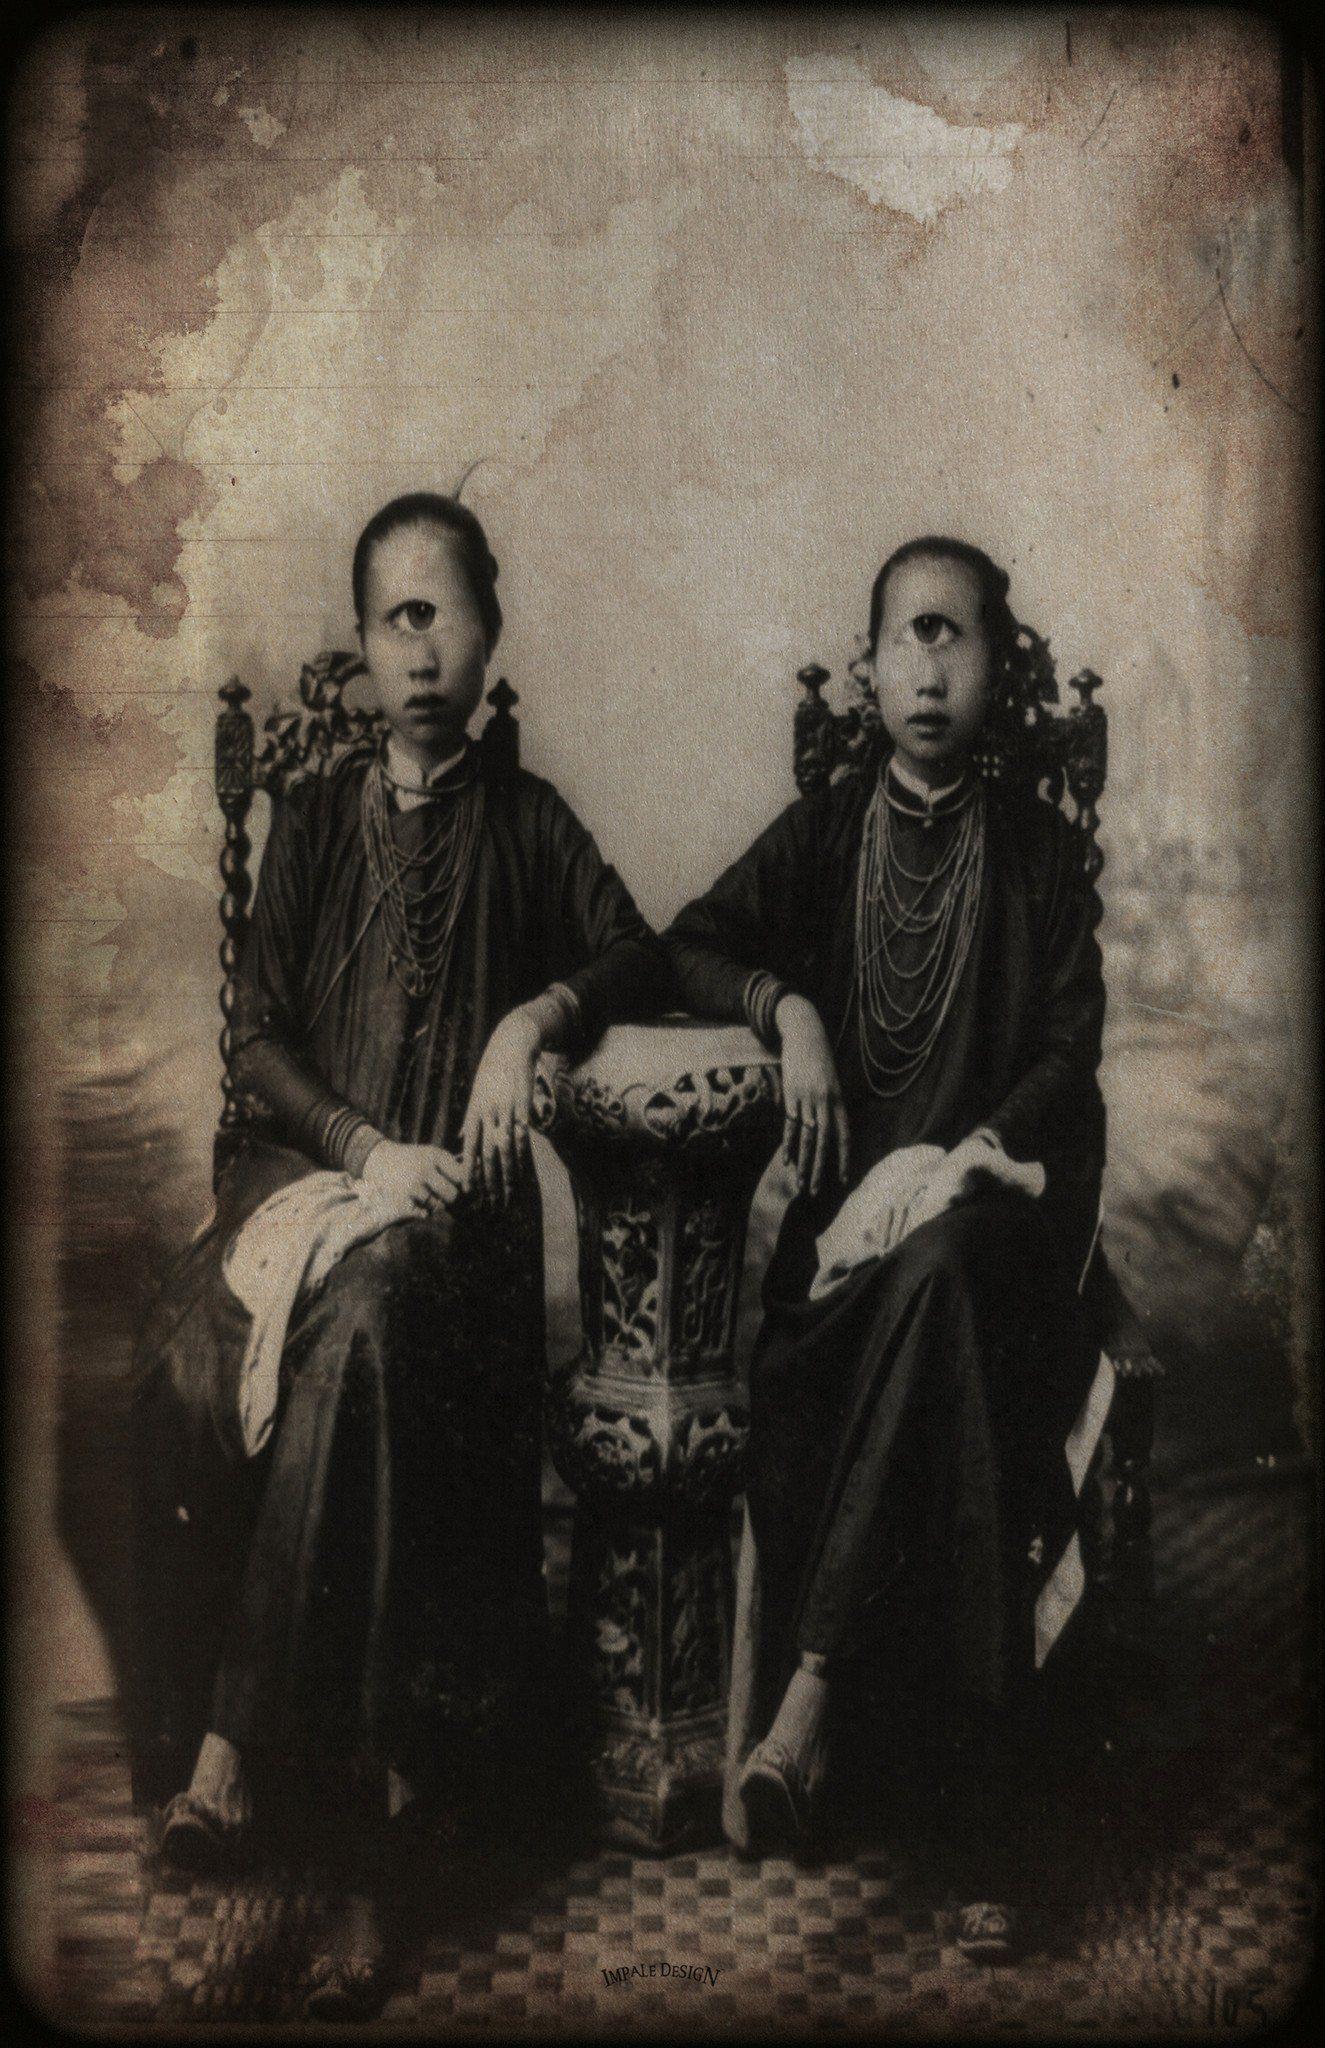 Cycloptic Siamese Thirteenth Floor Human Oddities Retro Photo History